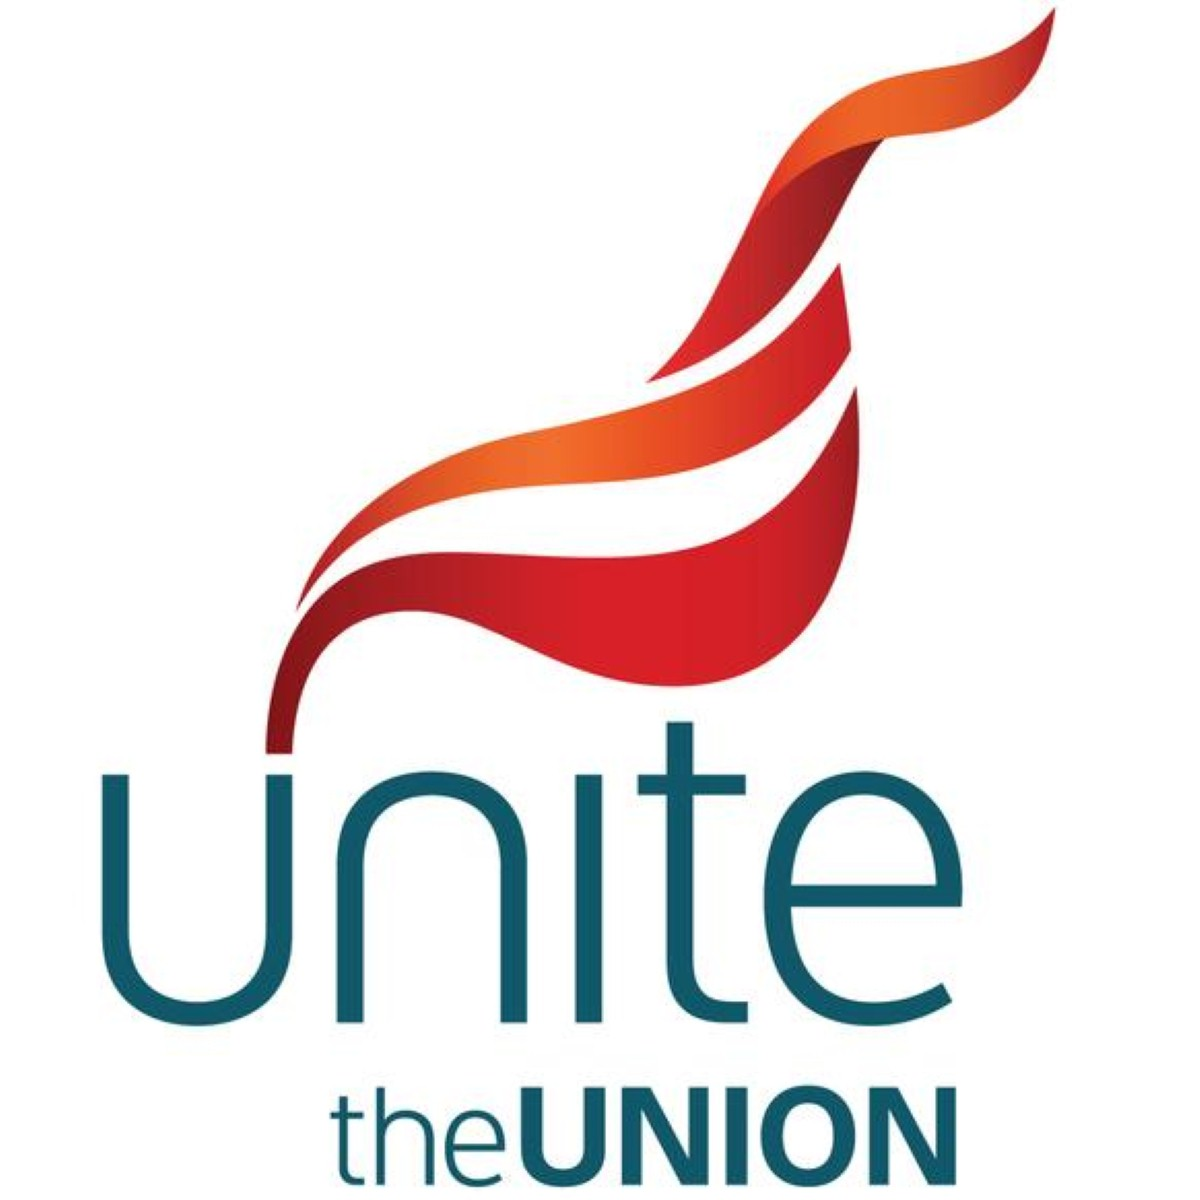 Unite: Bank workers deserve a strategic voice